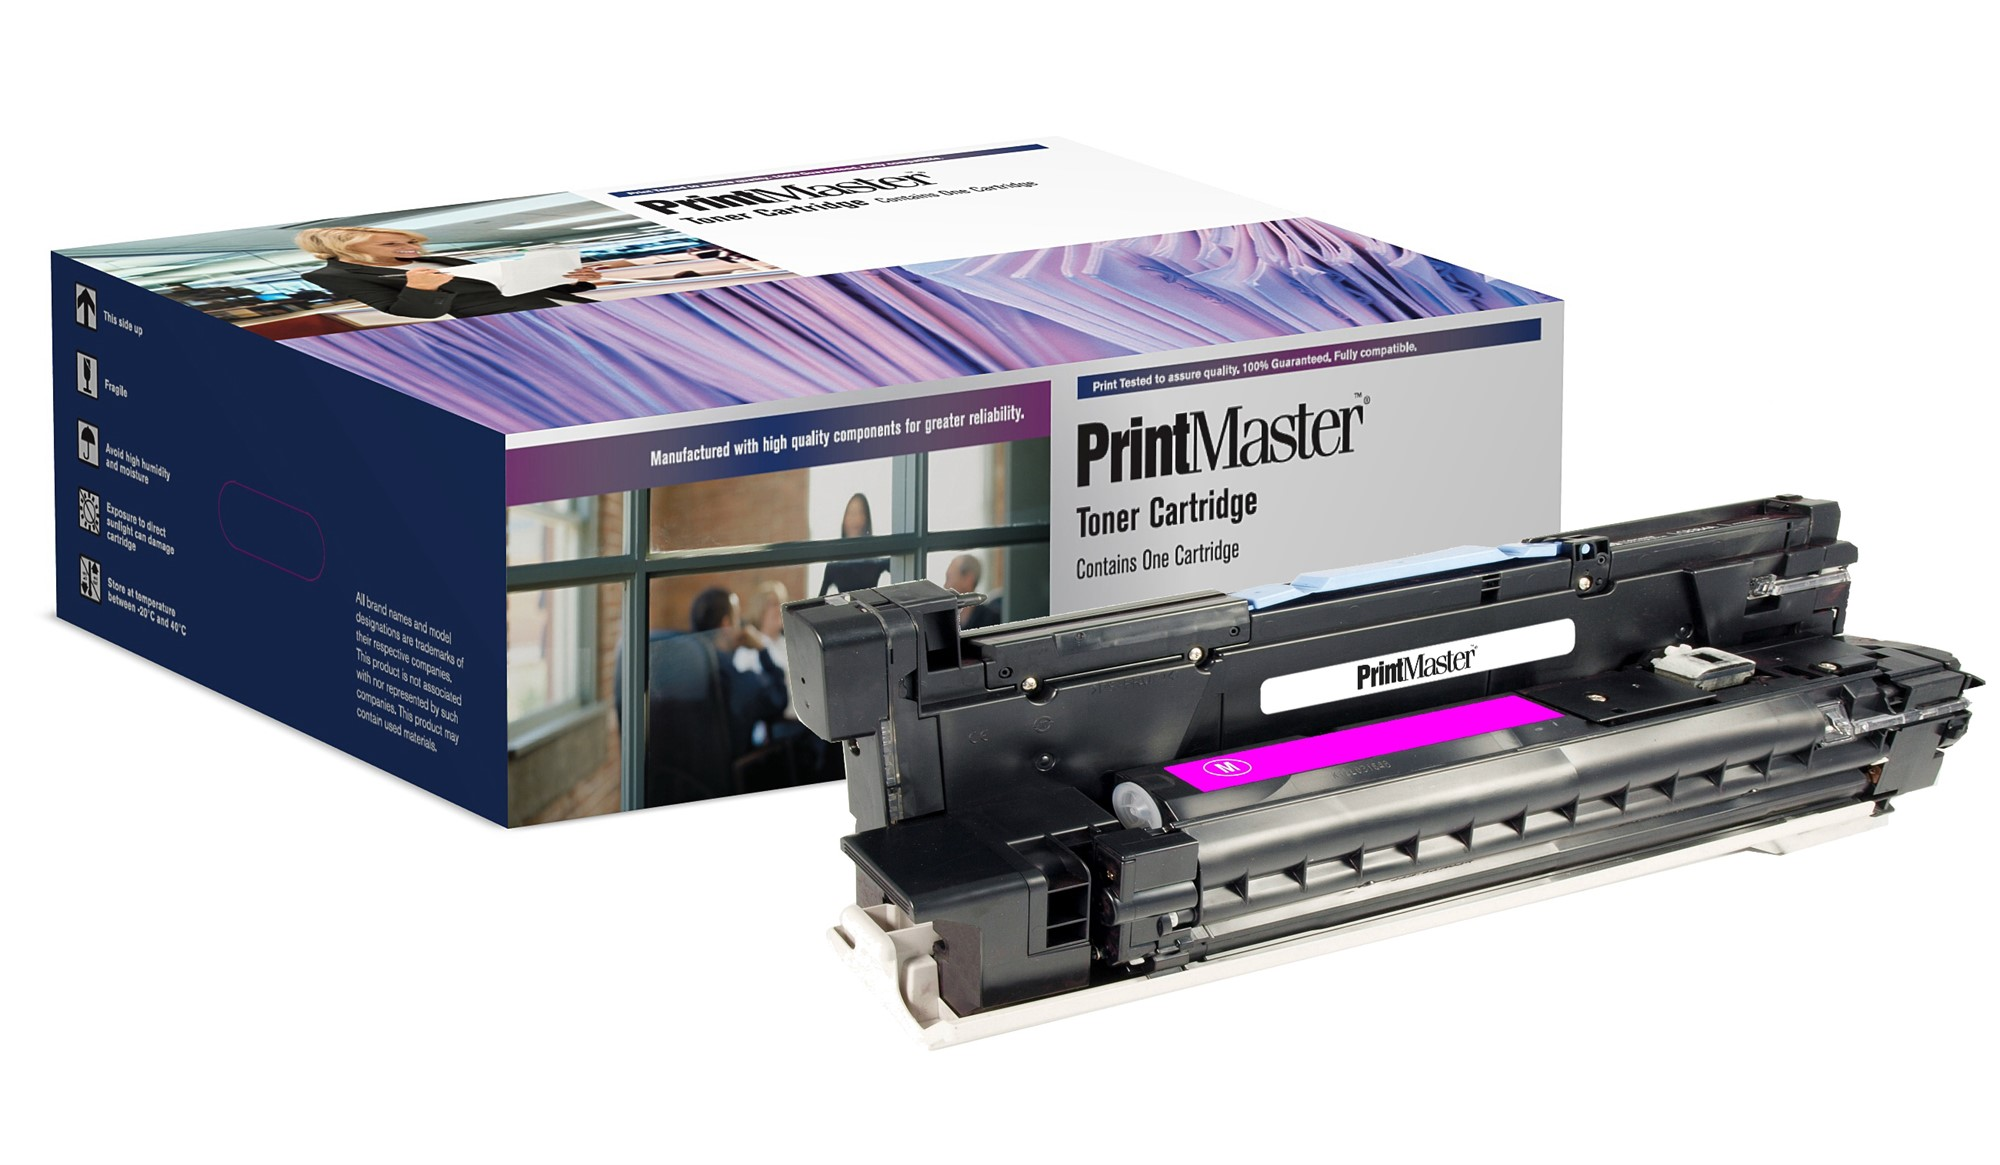 PrintMaster CP6015 Magenta Image Unit